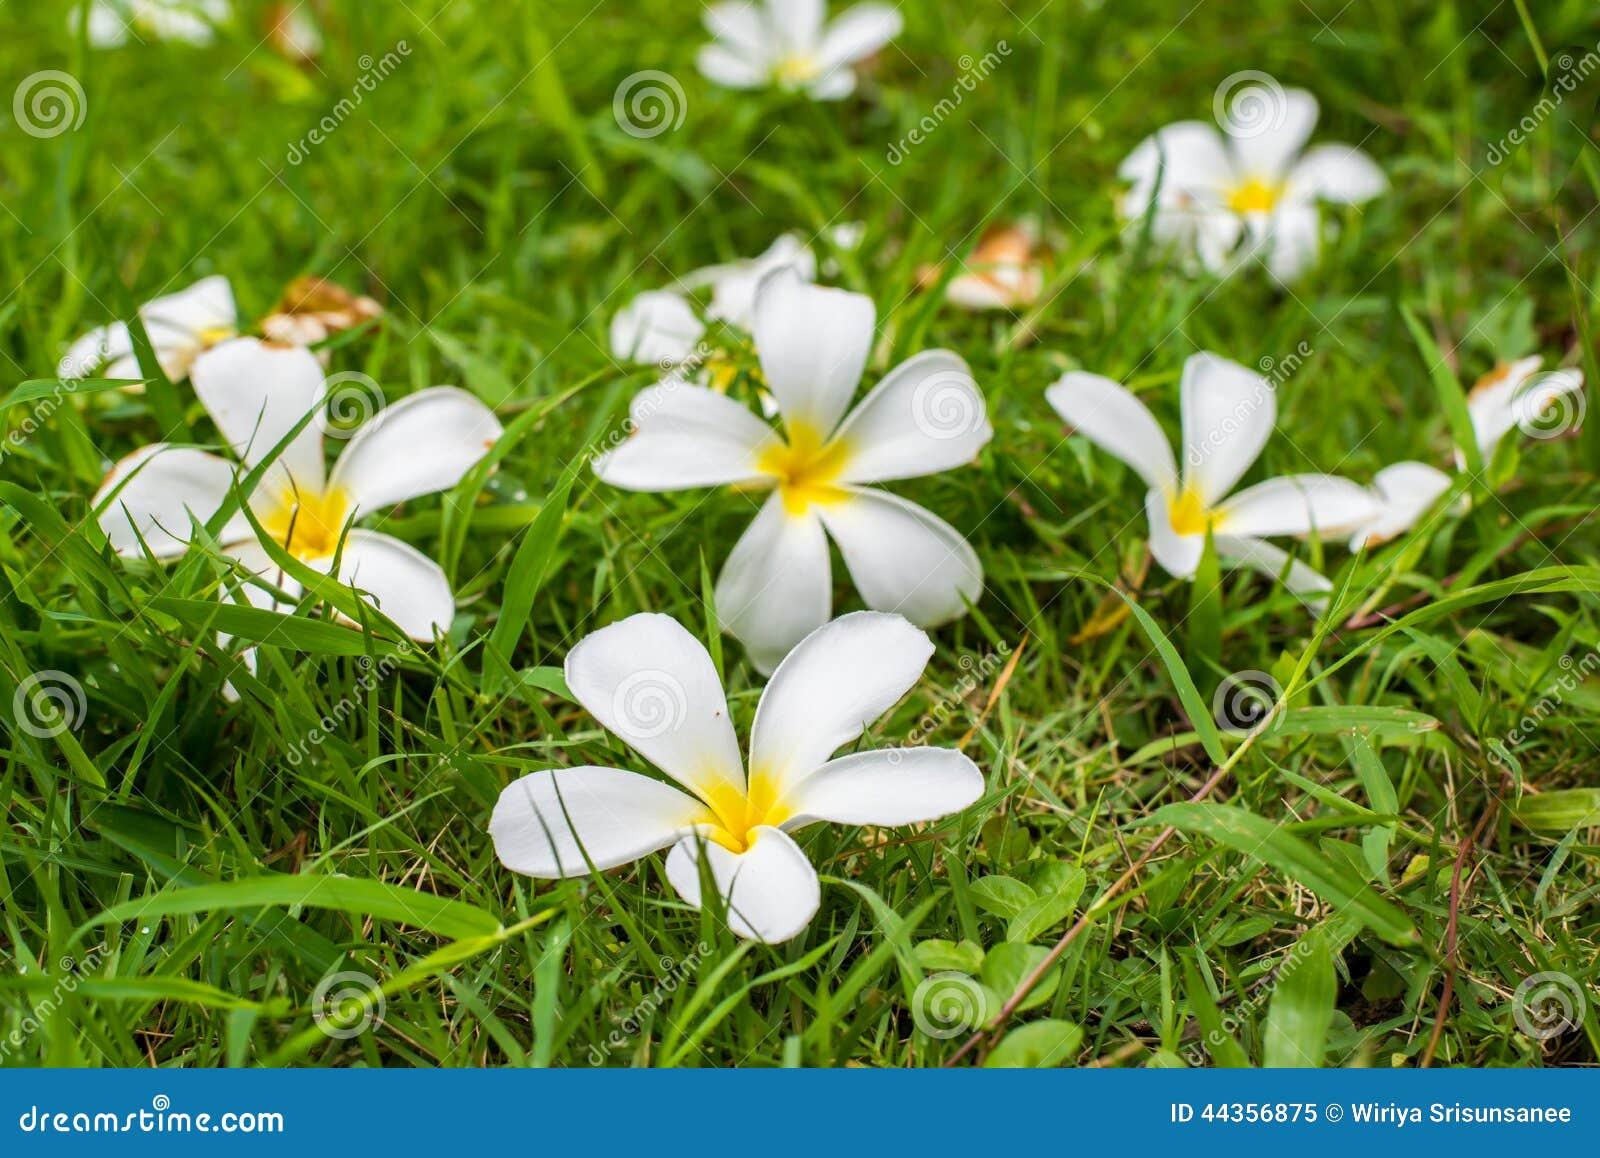 Leelavadee, Plumeria, flor tropical na grama